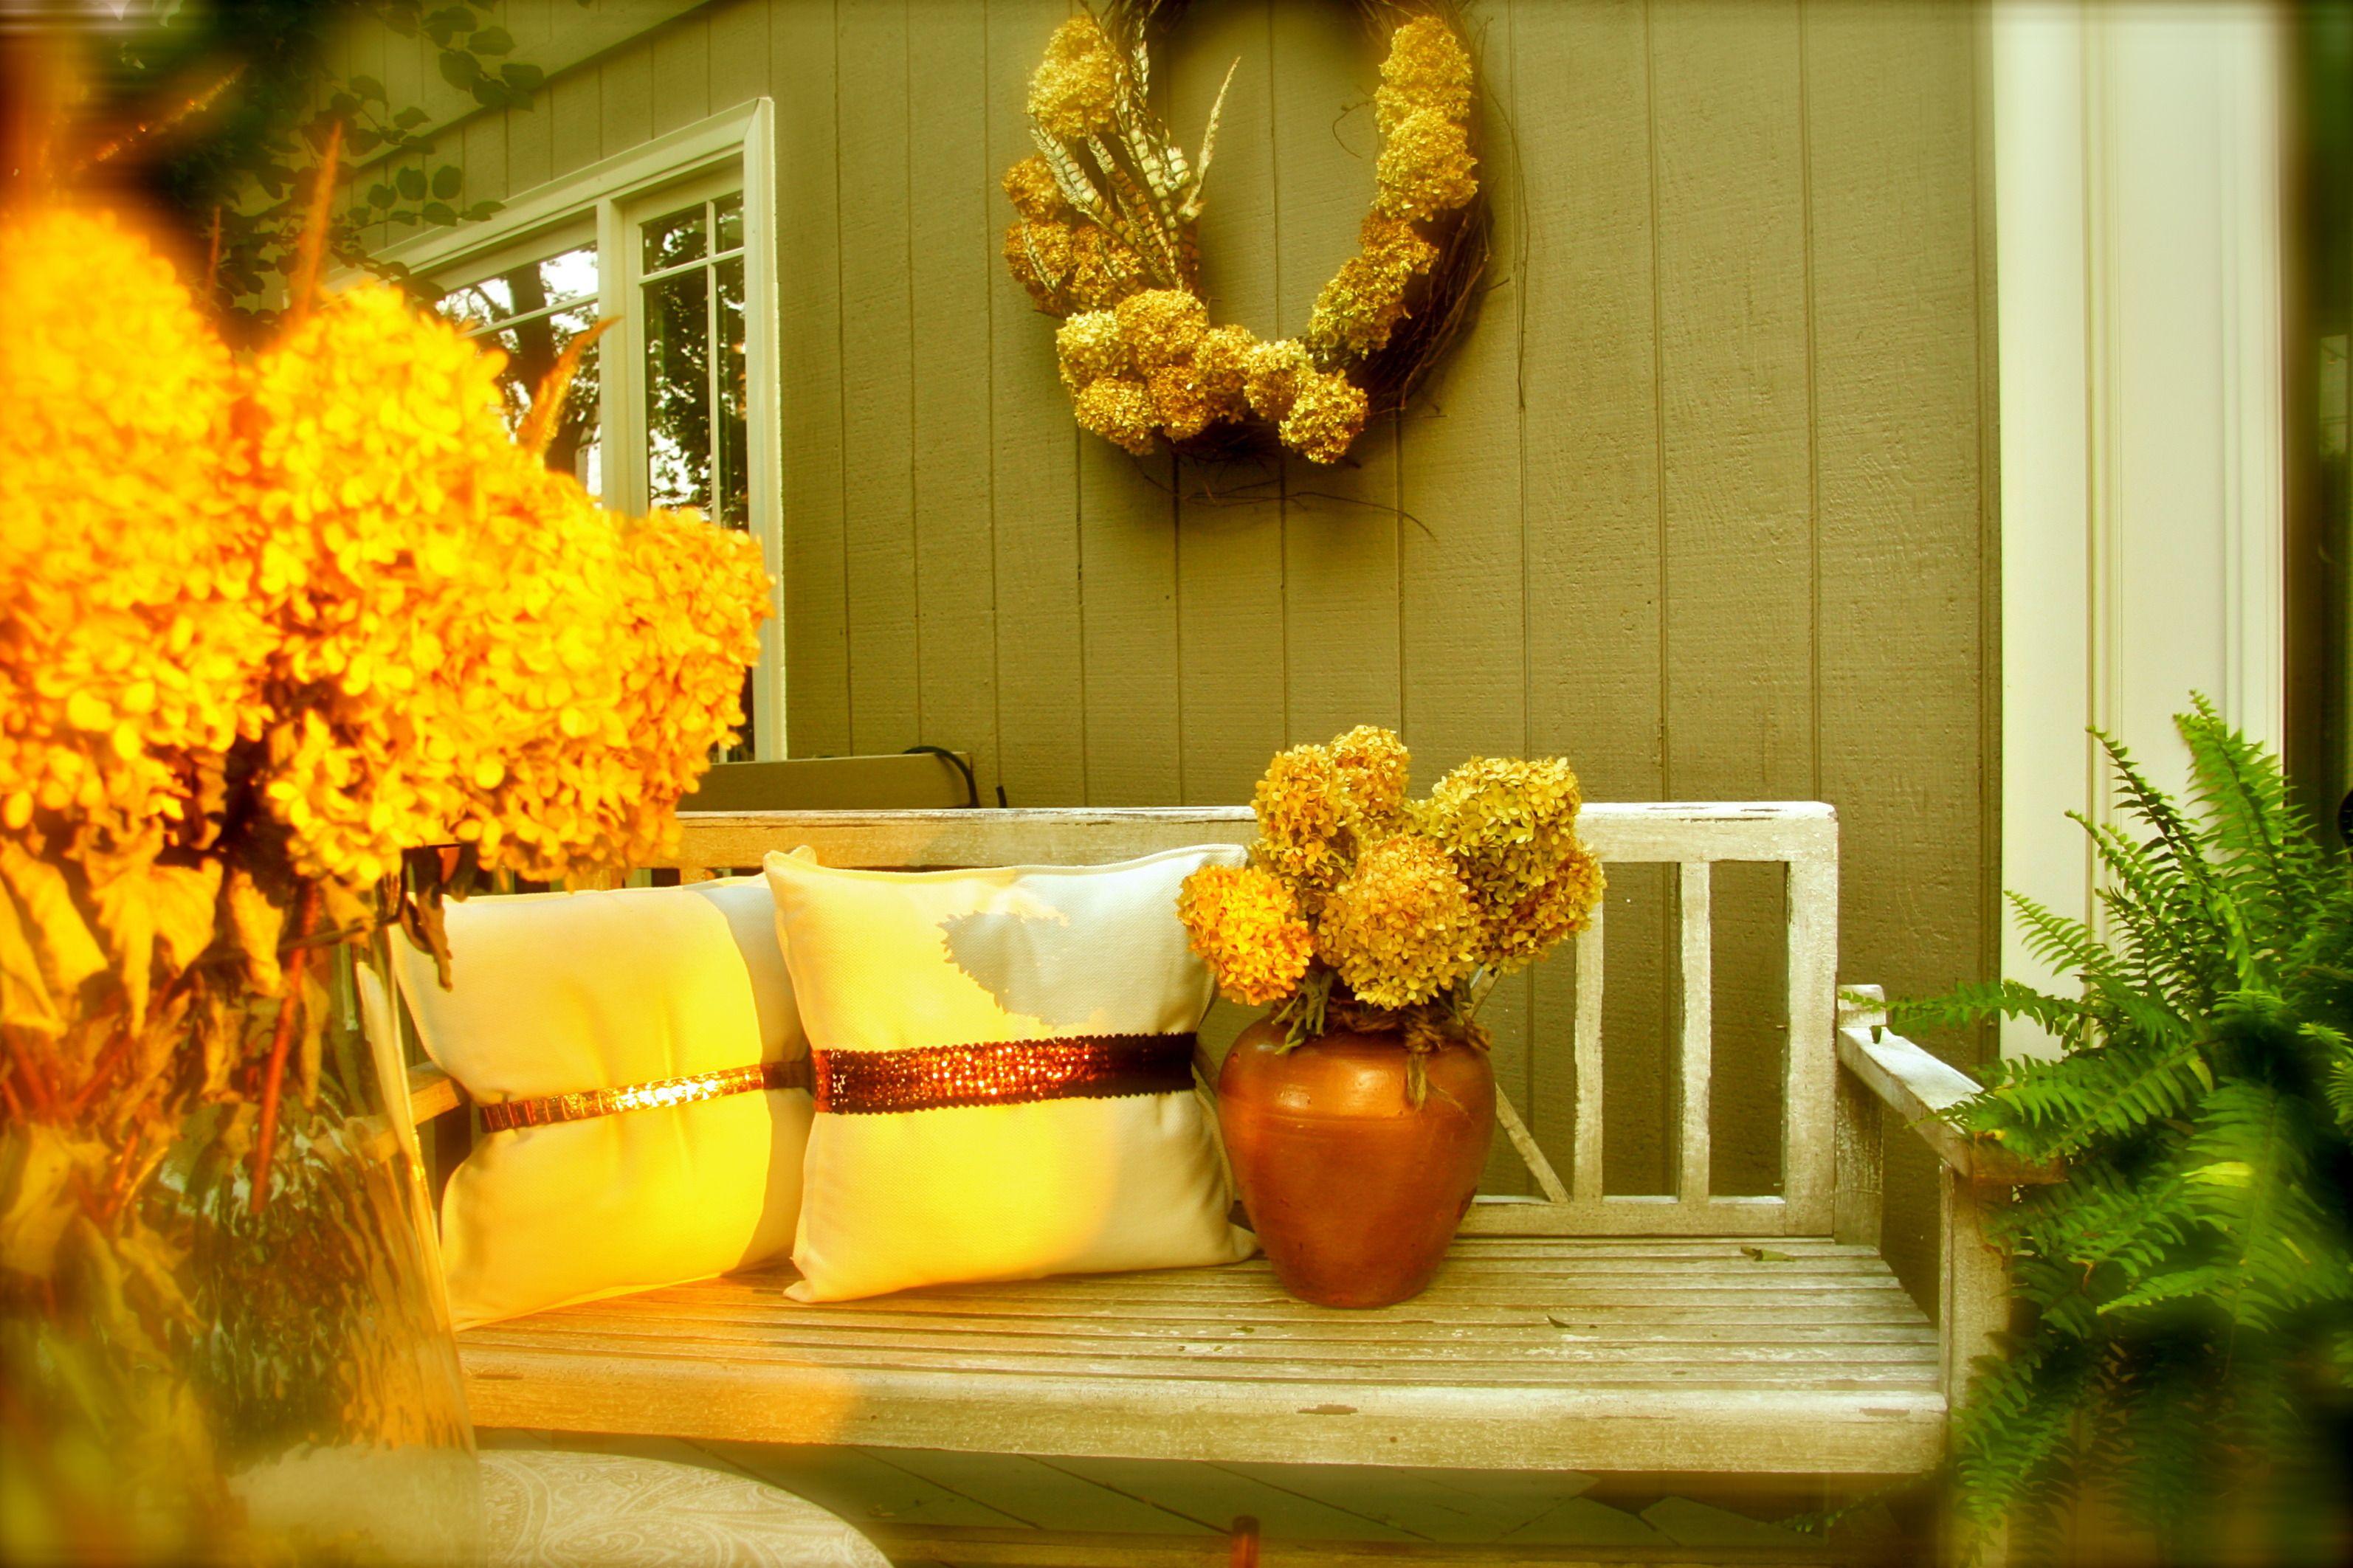 Pin by Angela on Flowers/Gardens Modern design, Design